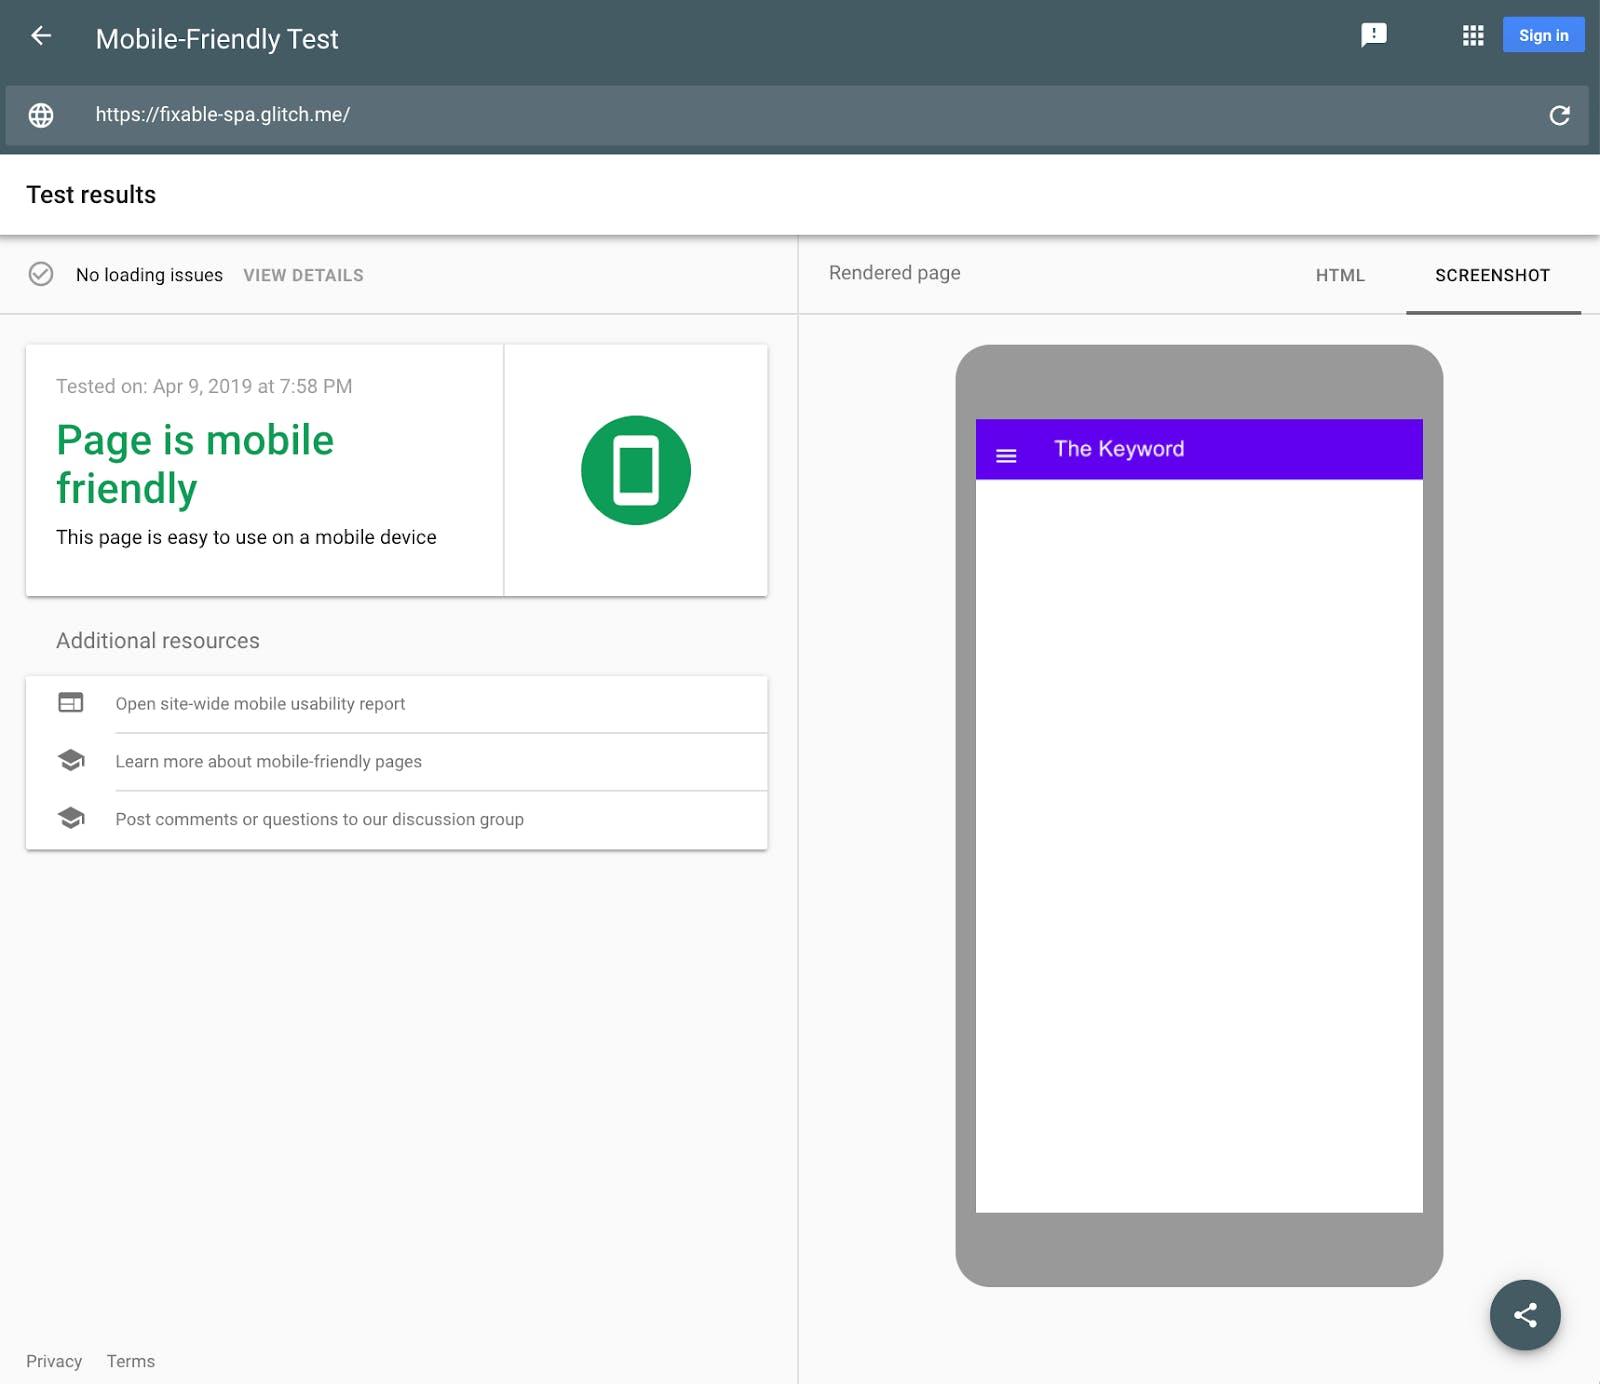 Google's Mobile-Friendly Test demonstrates